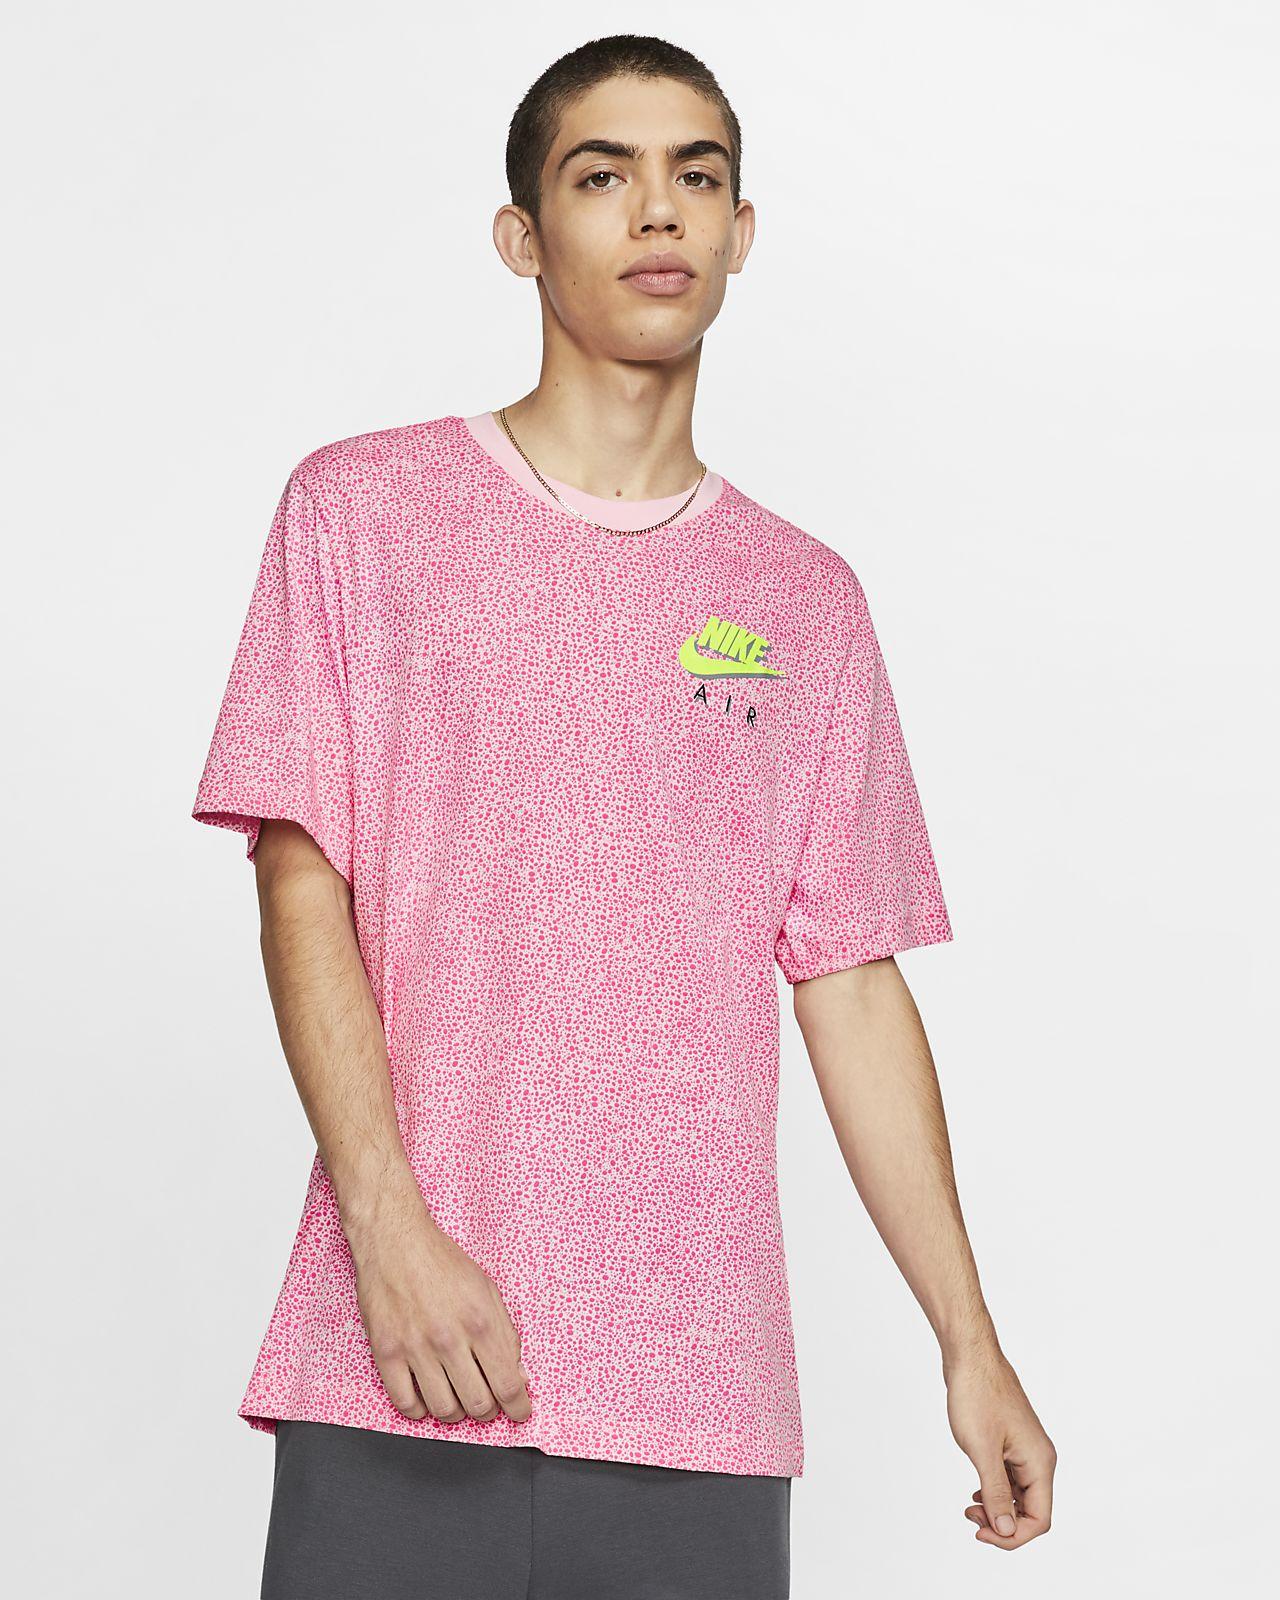 Tee-shirt imprimé Nike Sportswear pour Homme